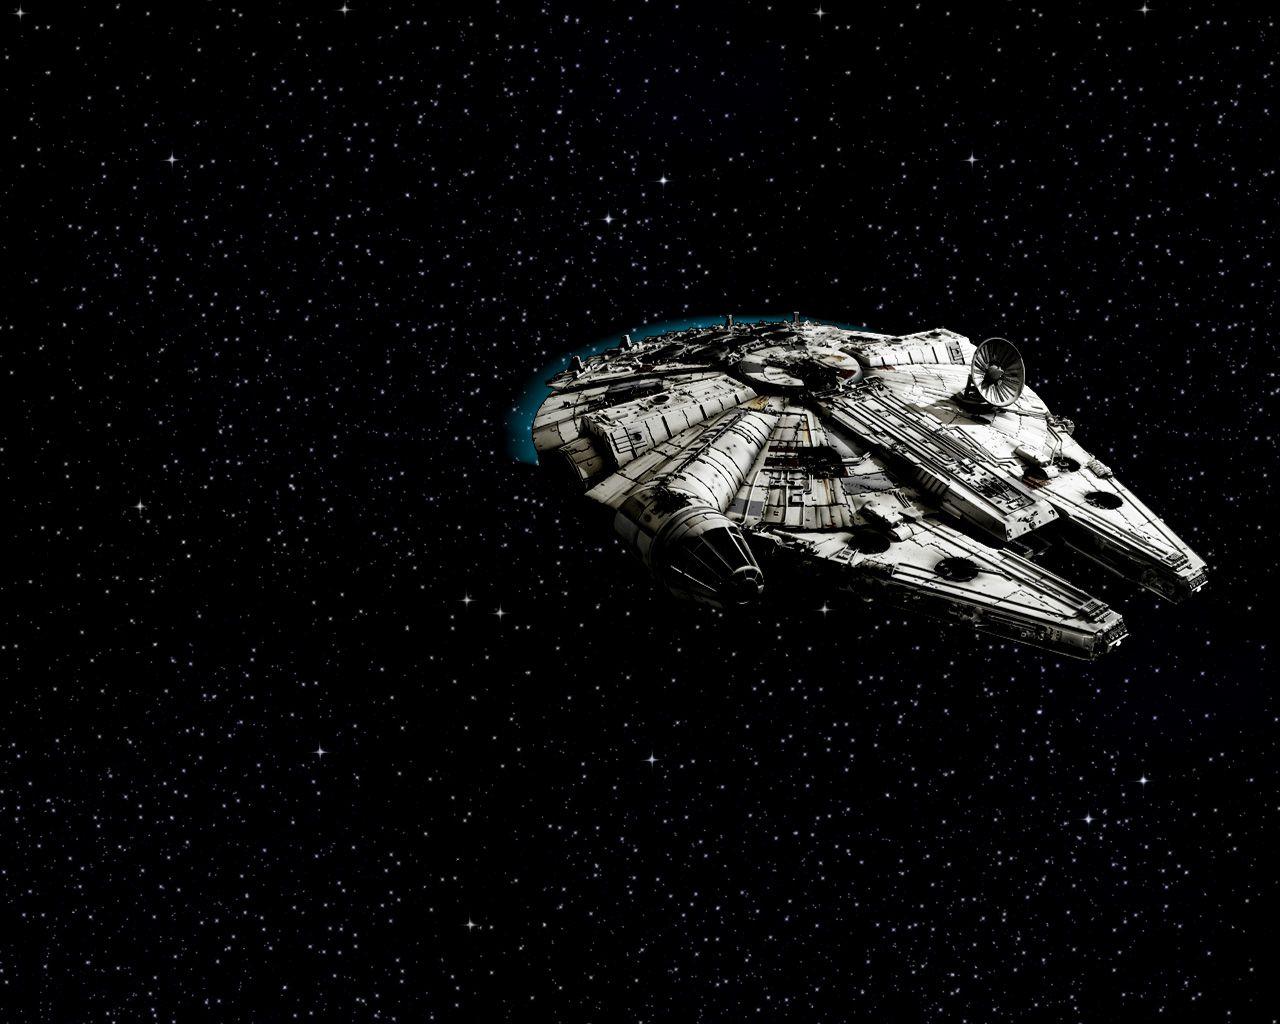 star wars millennium falcon - google search | realiteer - janet